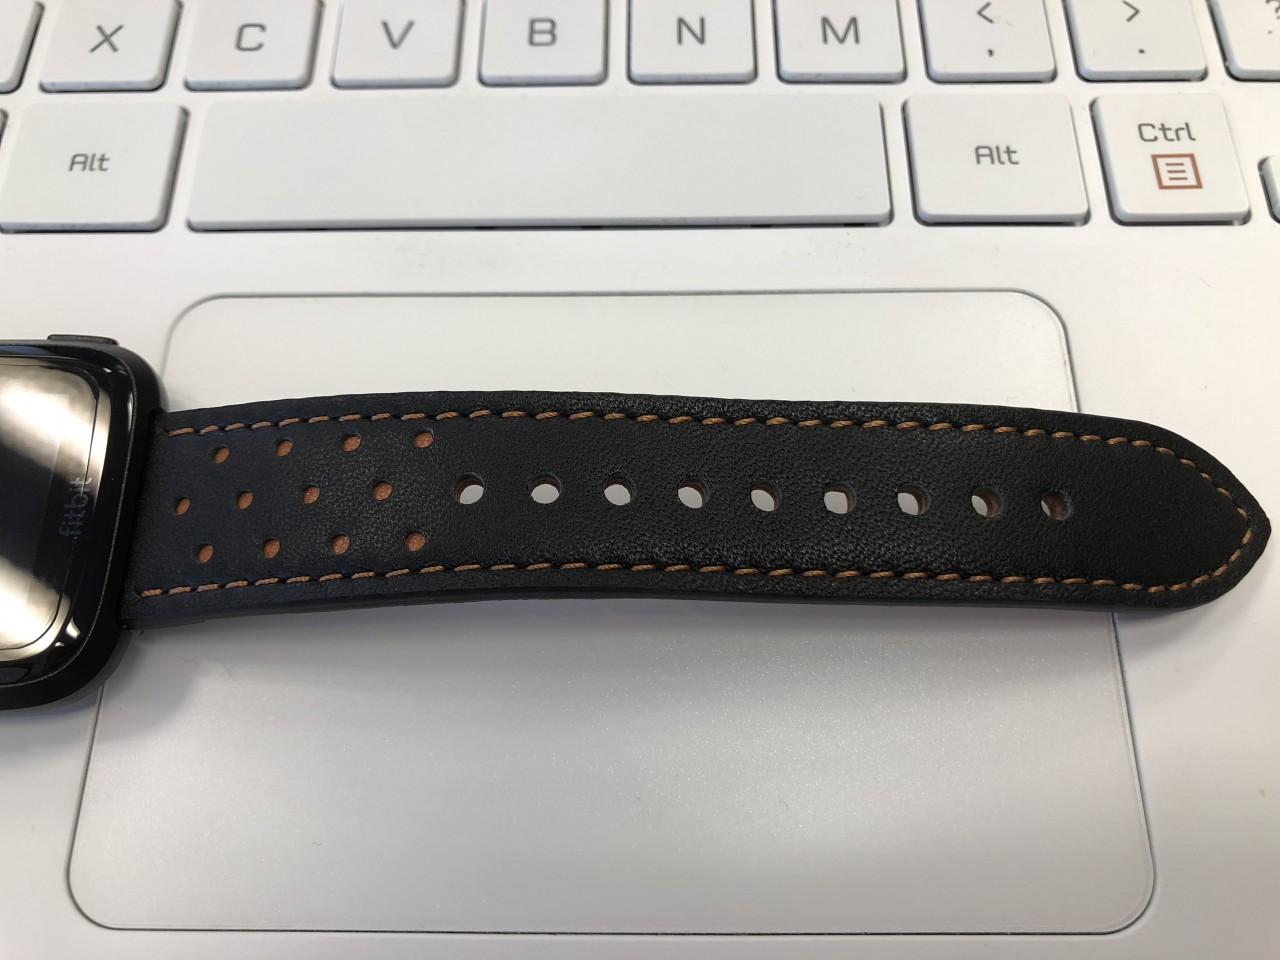 Kartice for Fitbit Versa高品質レザーバンド 剣先側